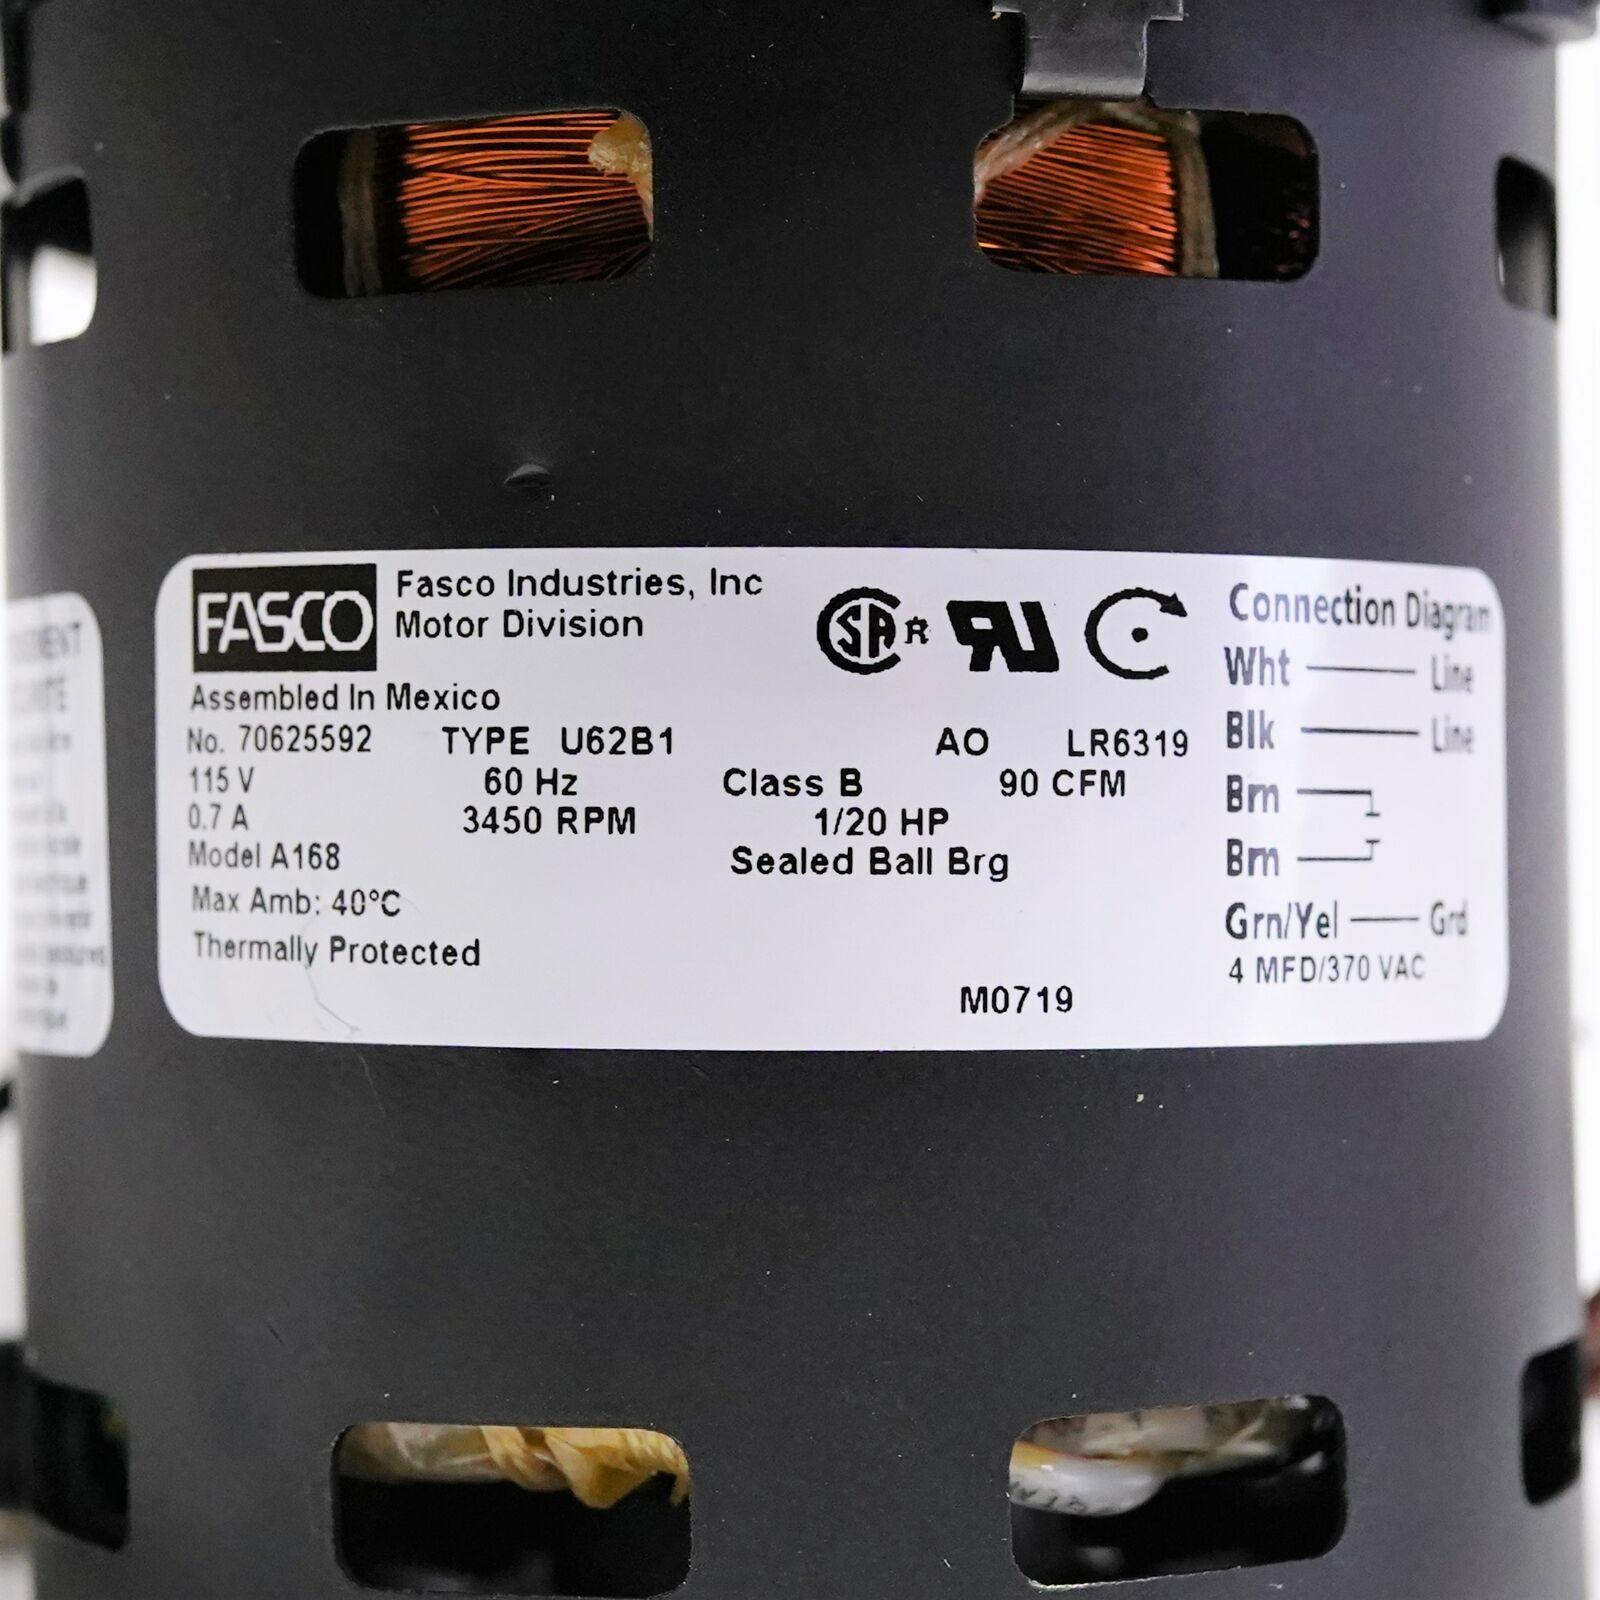 Fasco A168 115 Volt 3300 Rpm Furnace Draft Inducer Blower For Sale Online Ebay